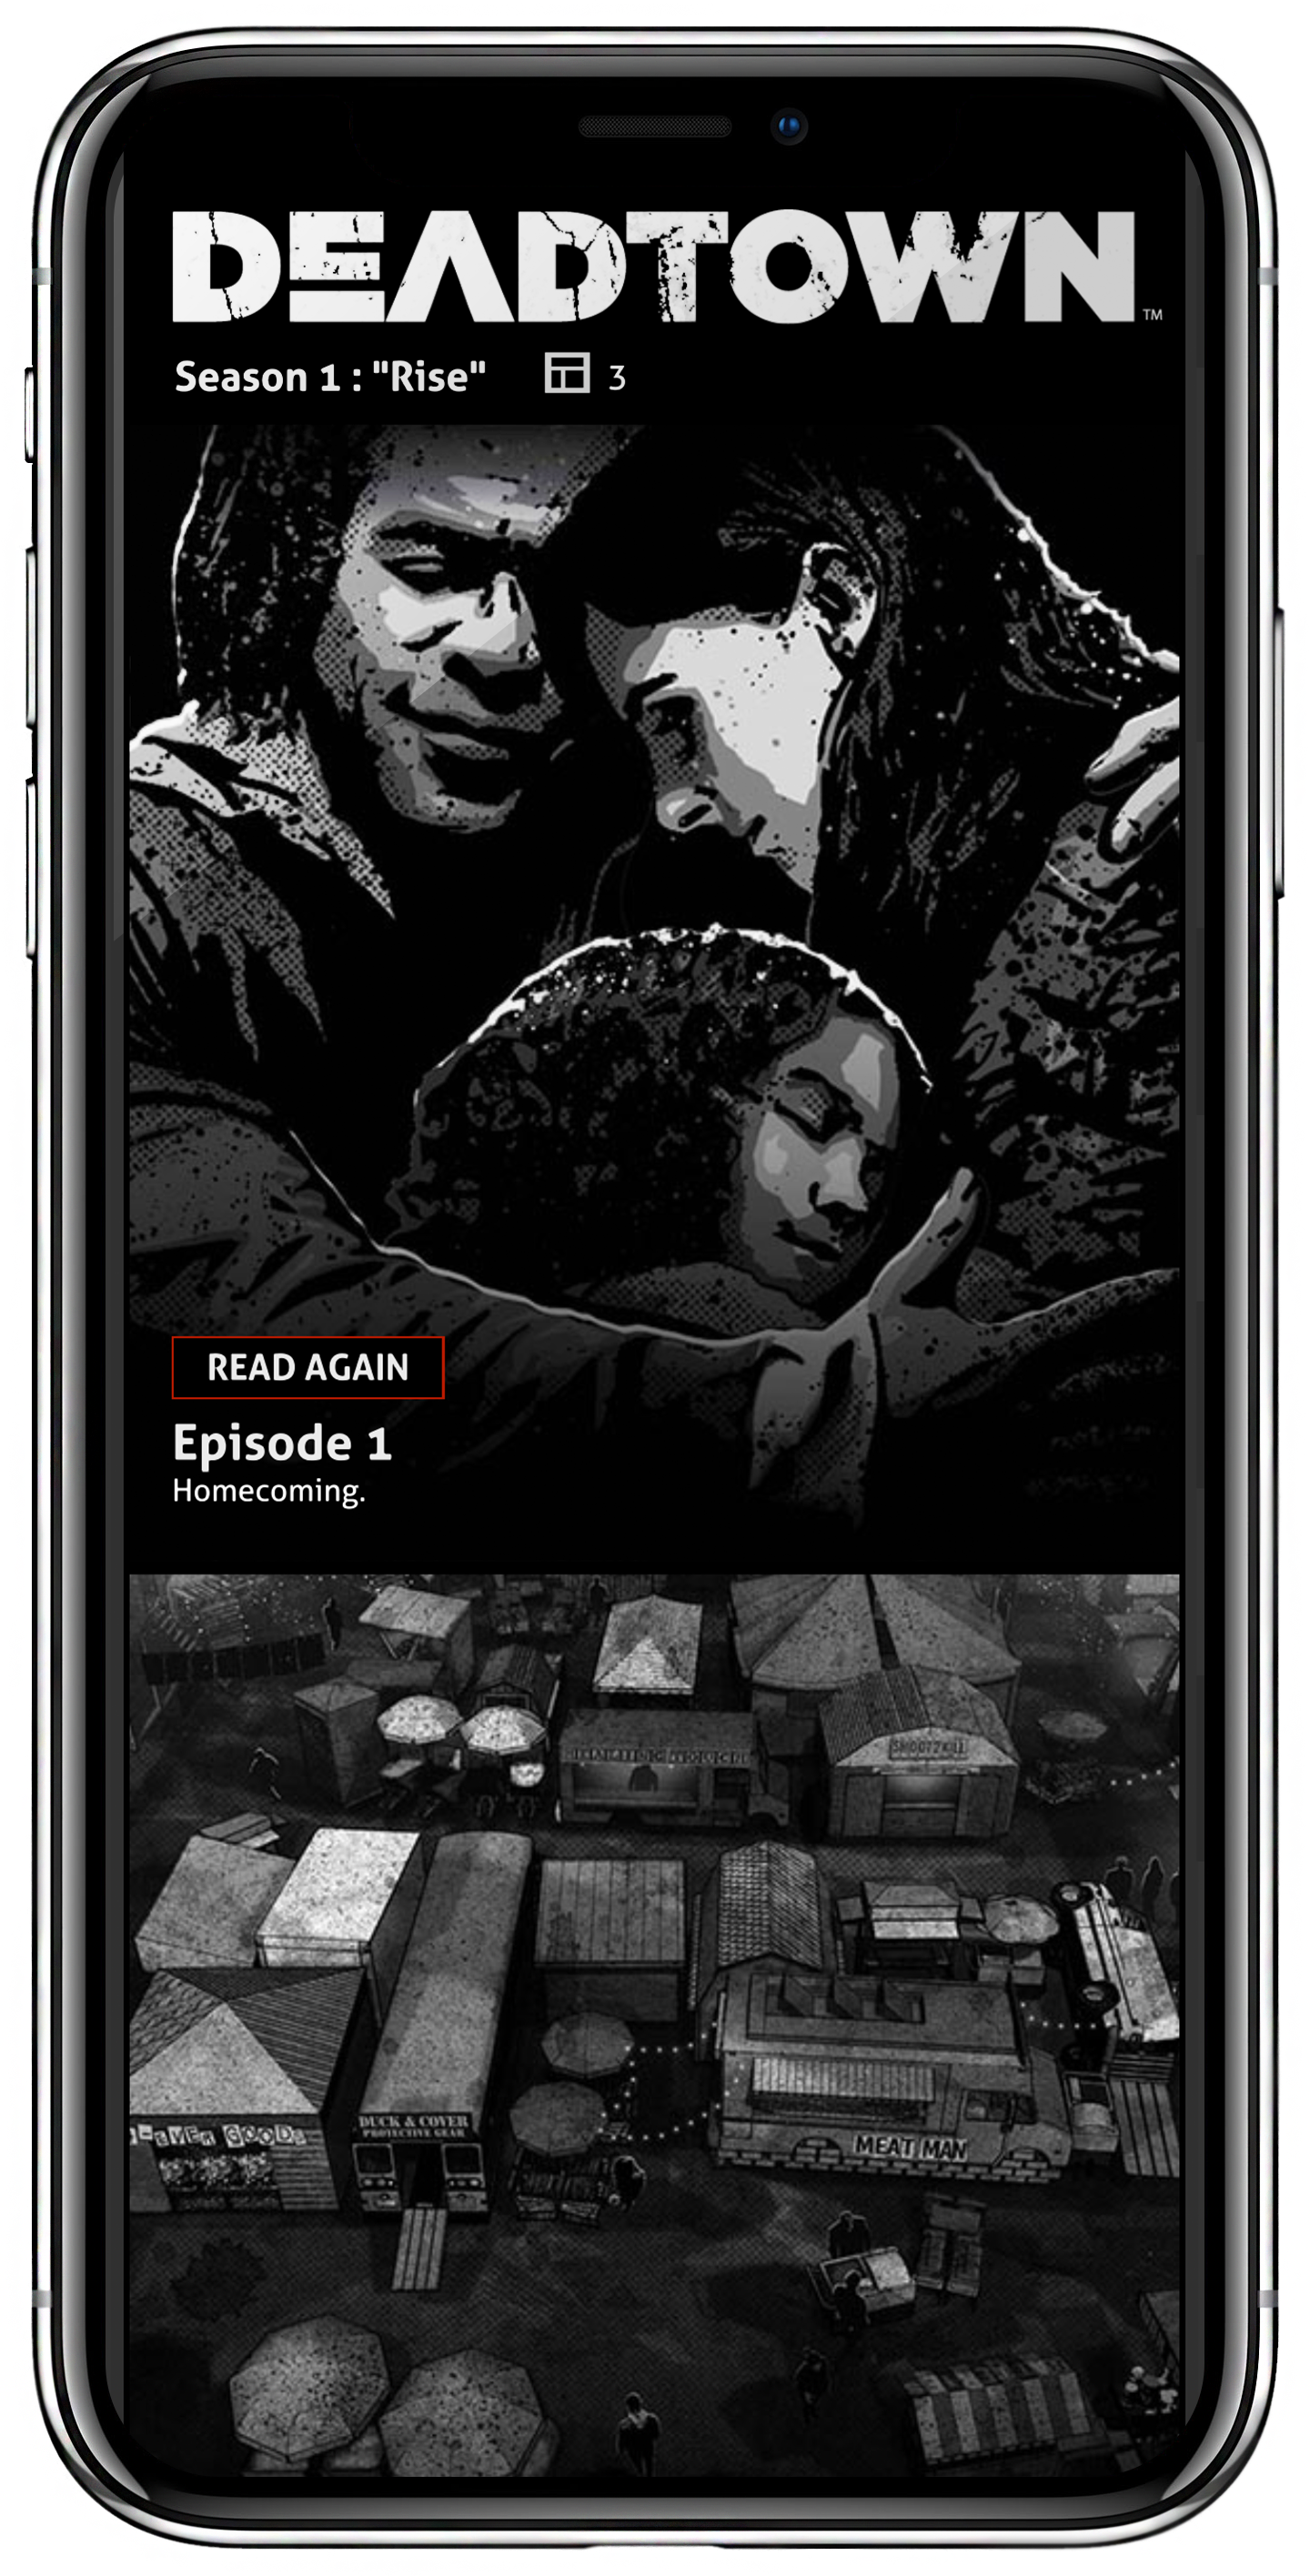 M2_DT_EpisodeSelection_iPhoneX.png